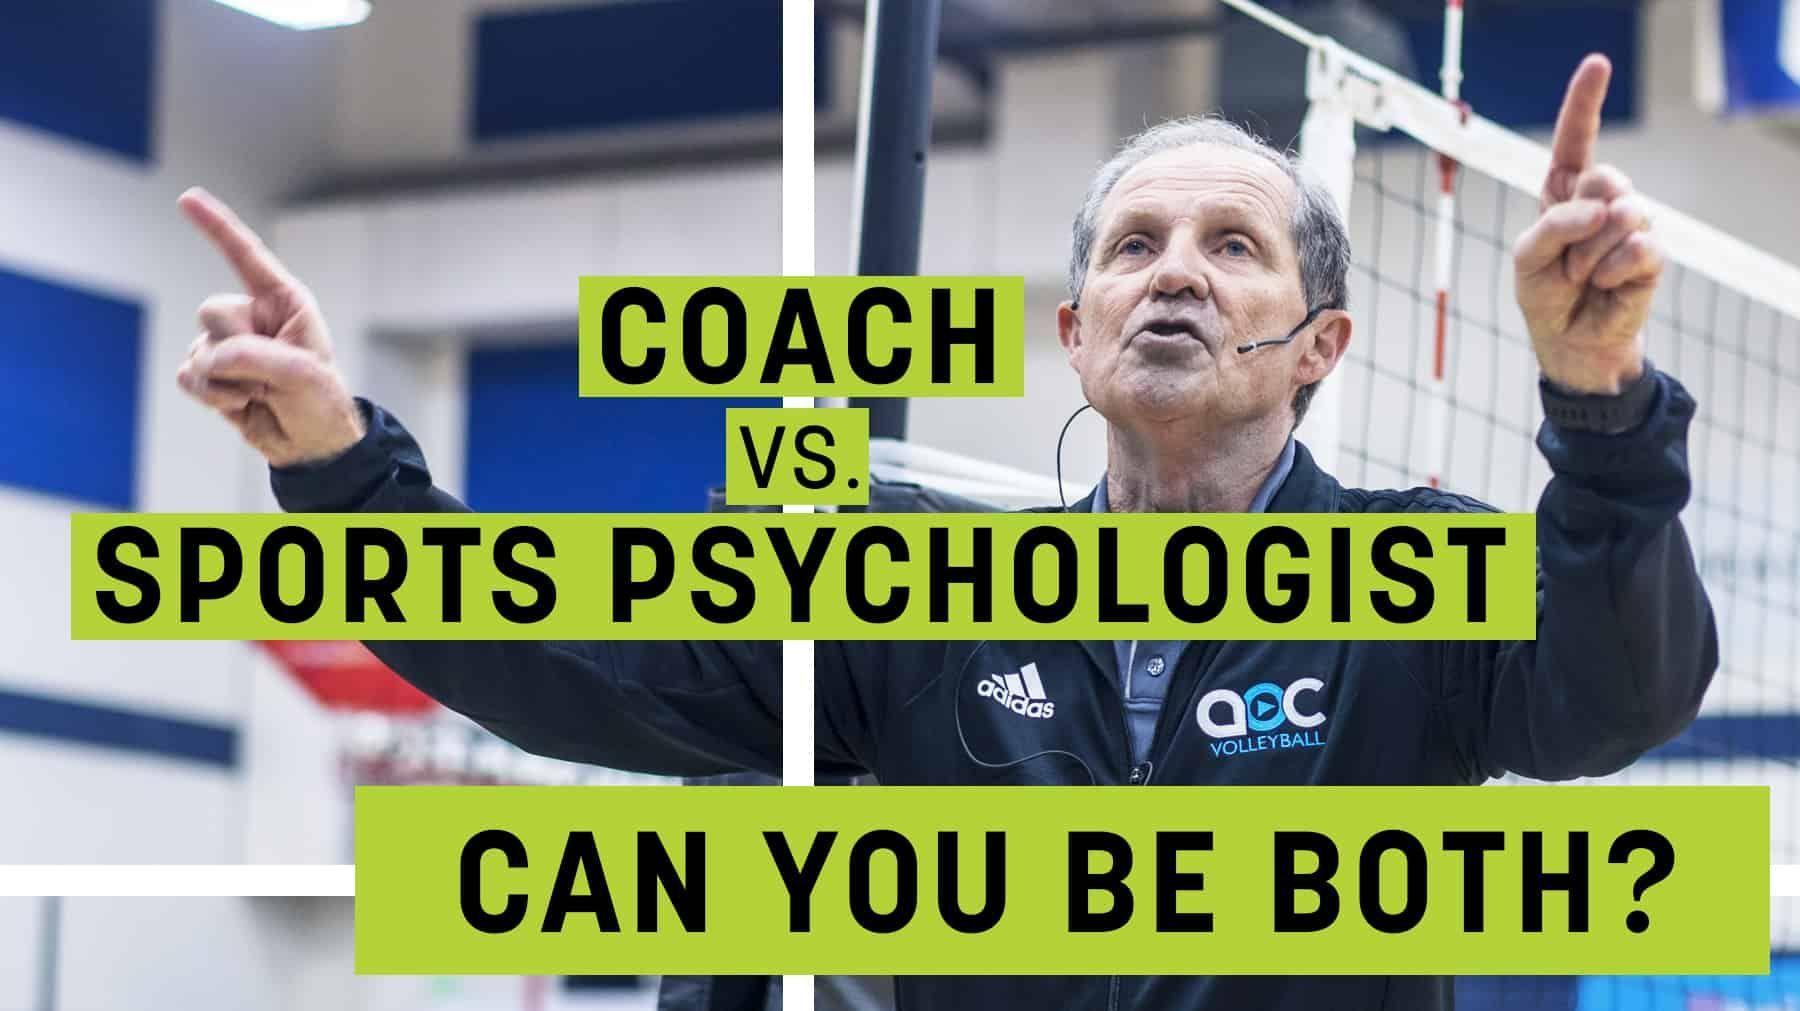 Coach vs. sports psychologist Can you be both Coaching